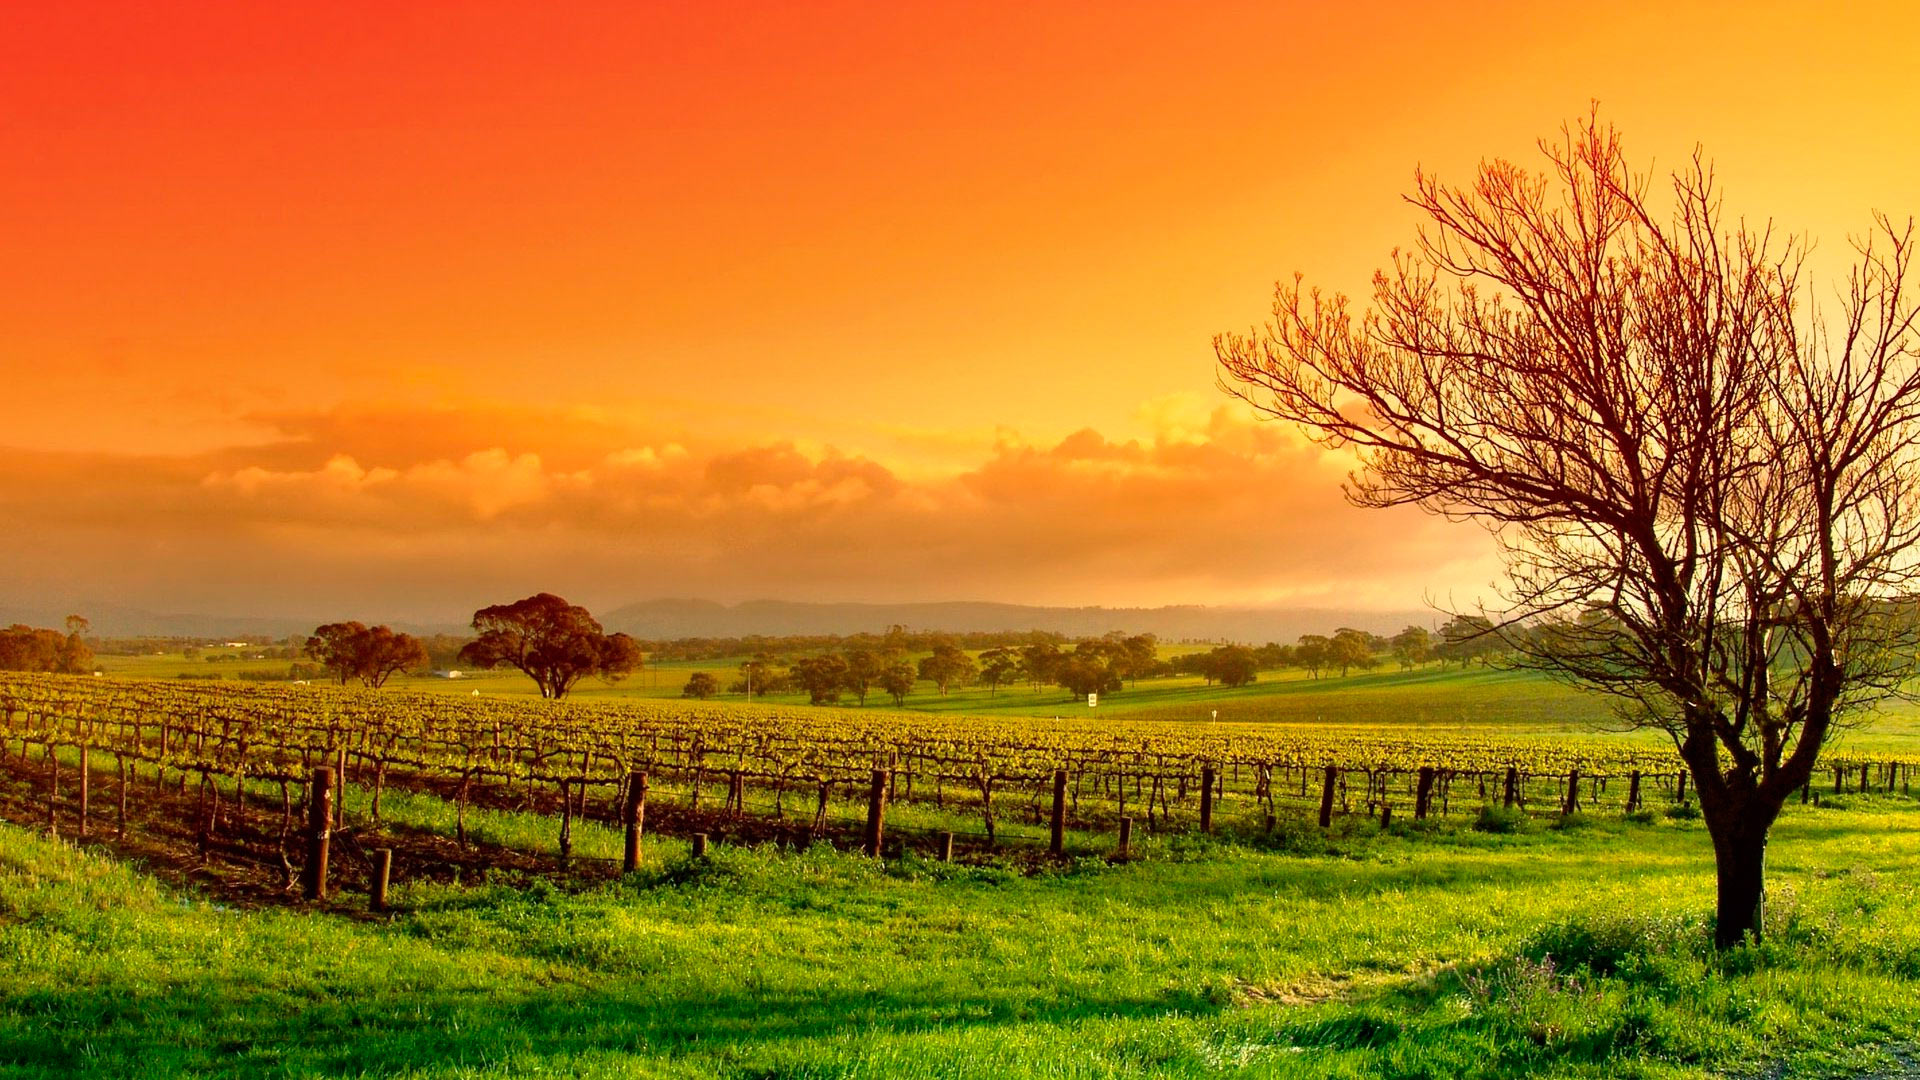 Vineyard Wallpaper 26360 1366x768 px